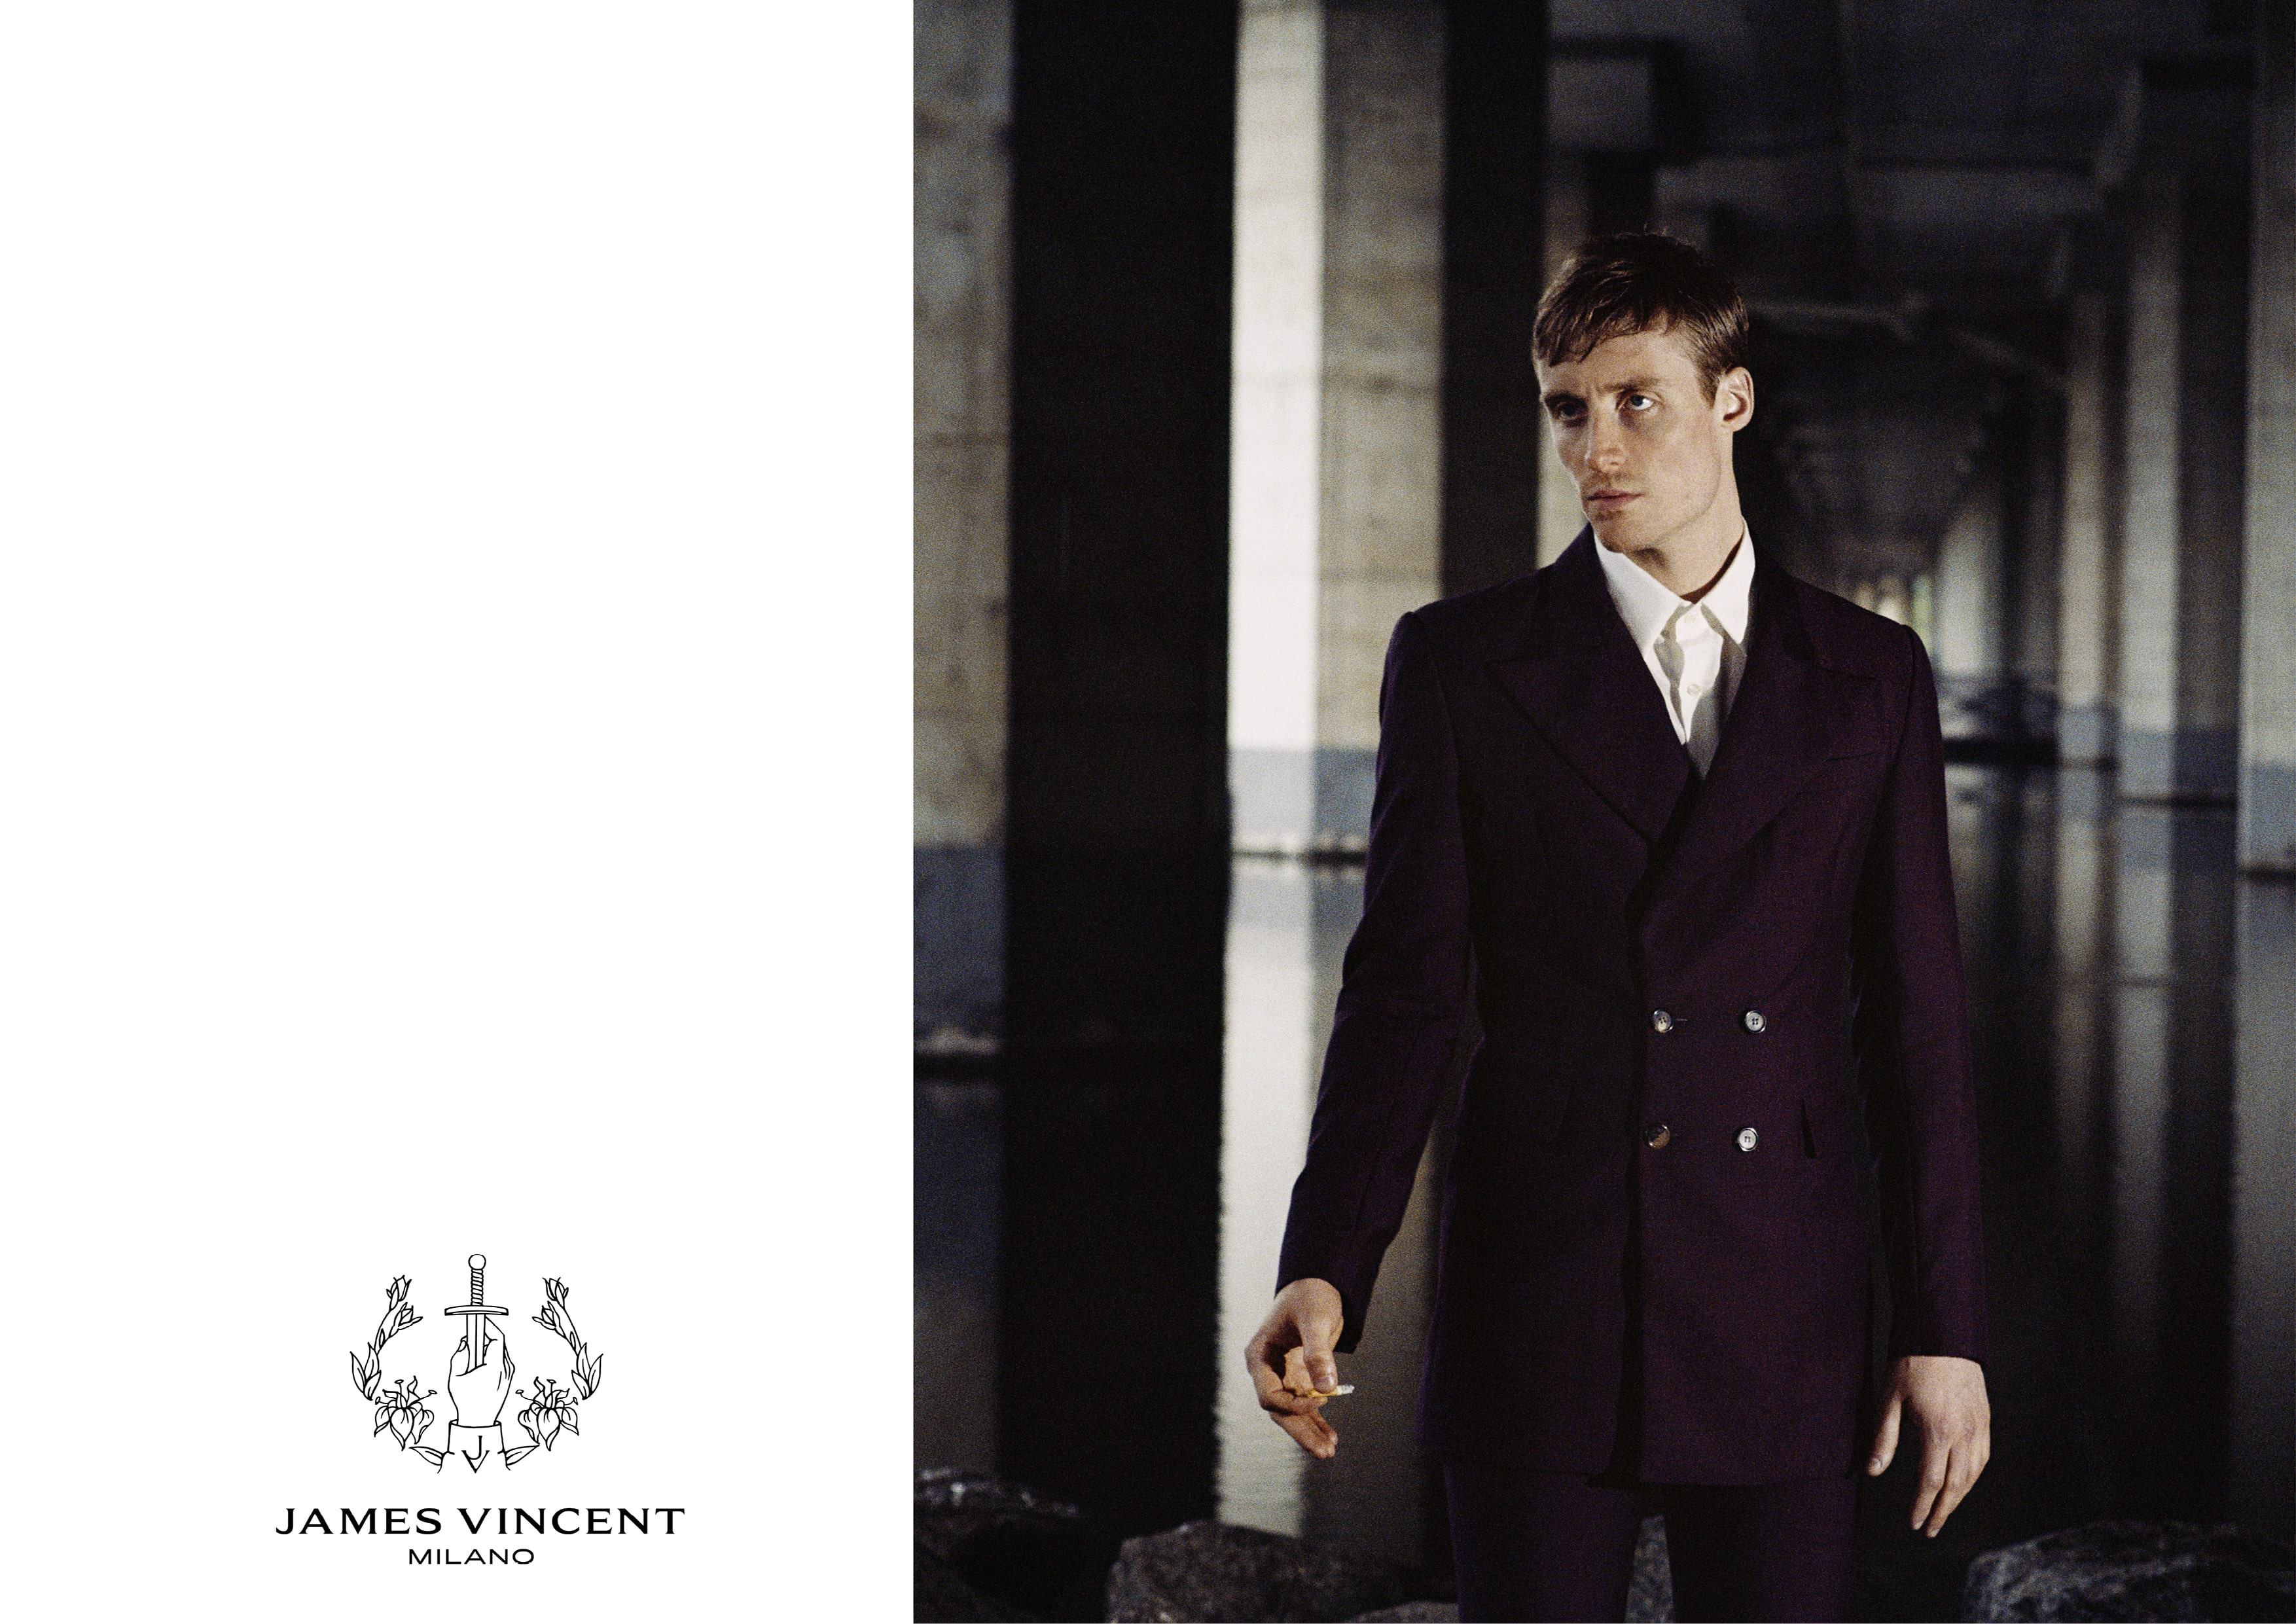 James-Vincent-Campaign-I-05